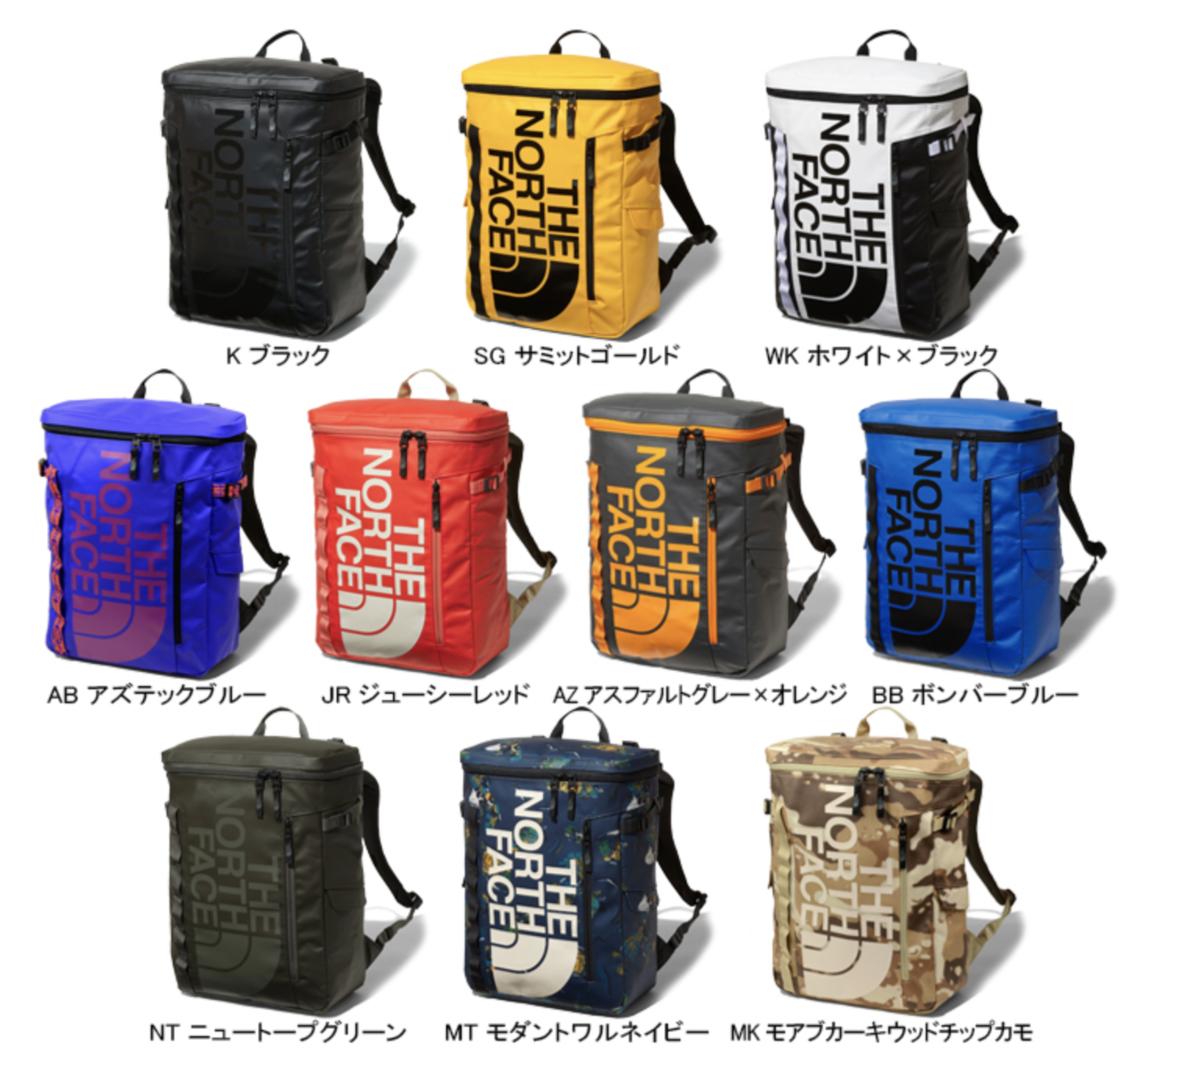 f:id:thebackpack:20190720211155p:plain